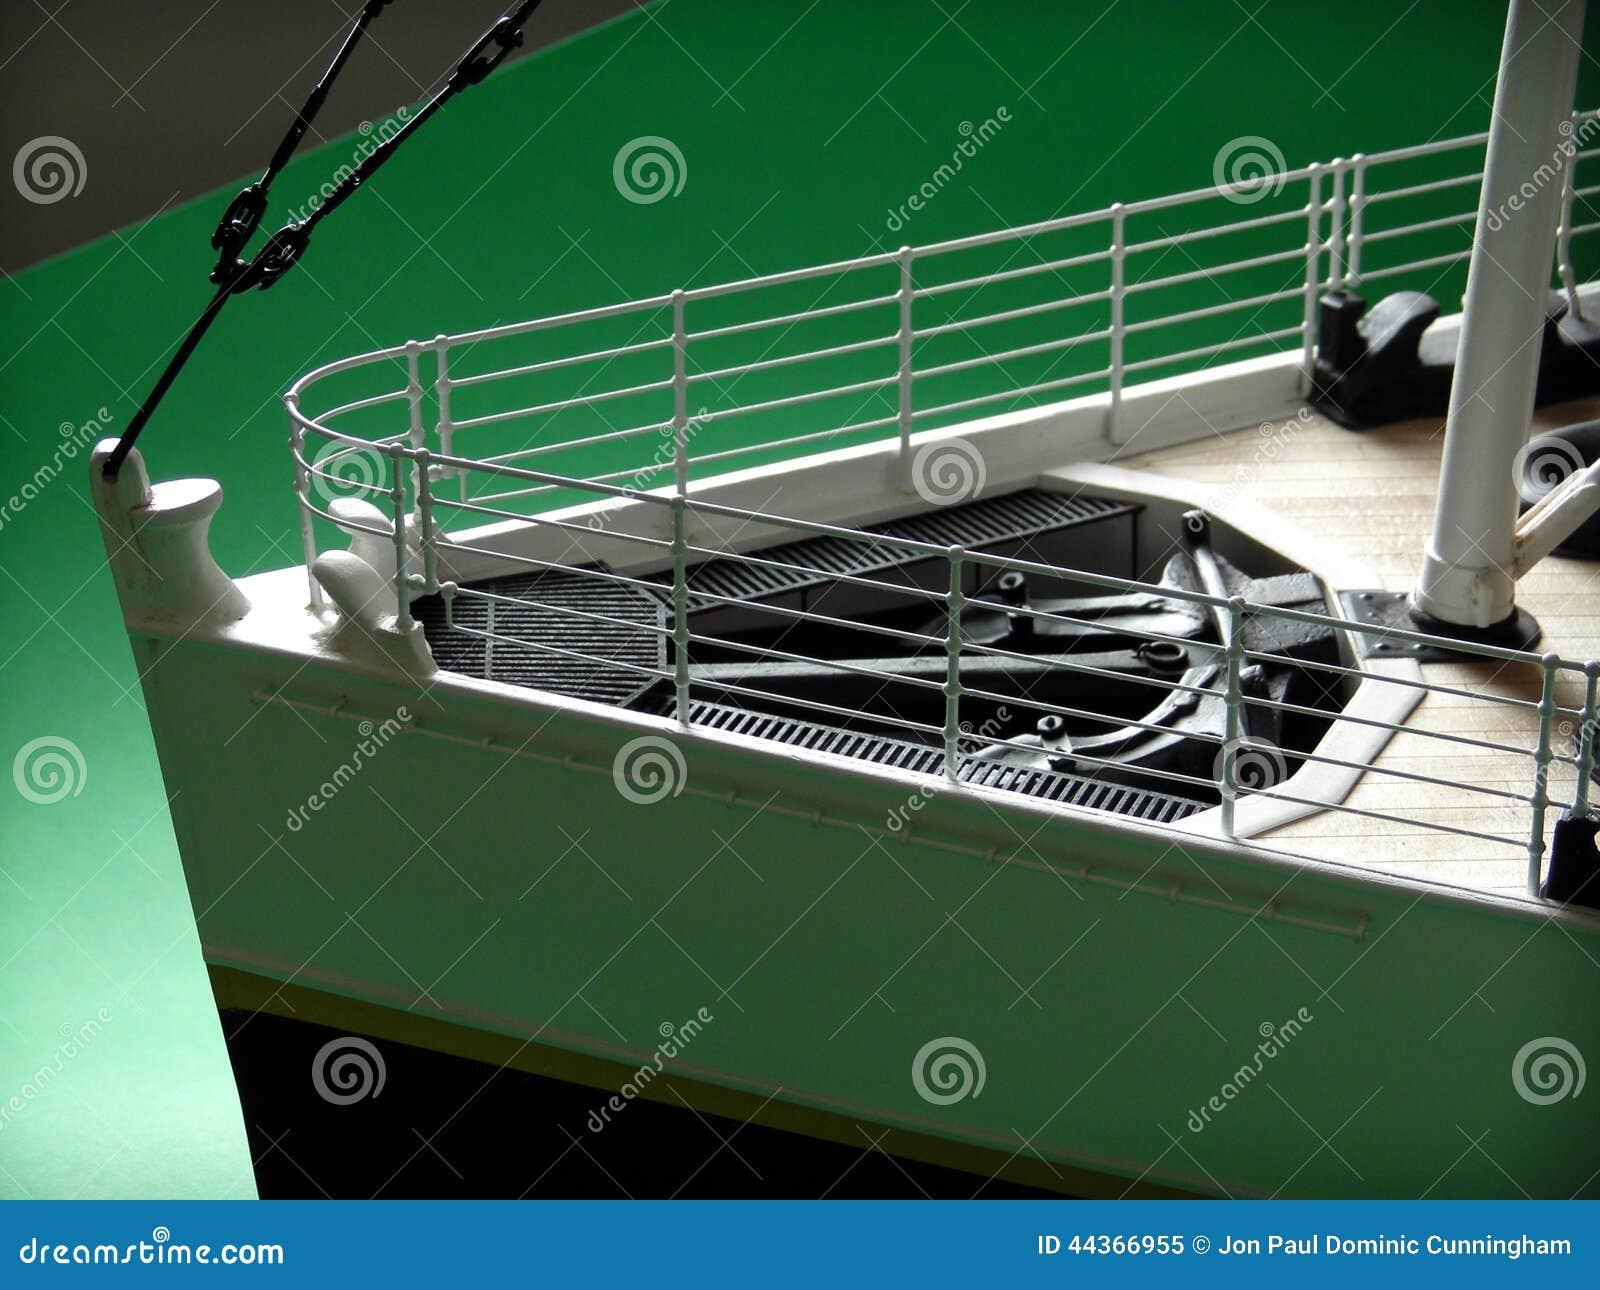 Titanic Model Greenscreen Stock Photo Image 44366955